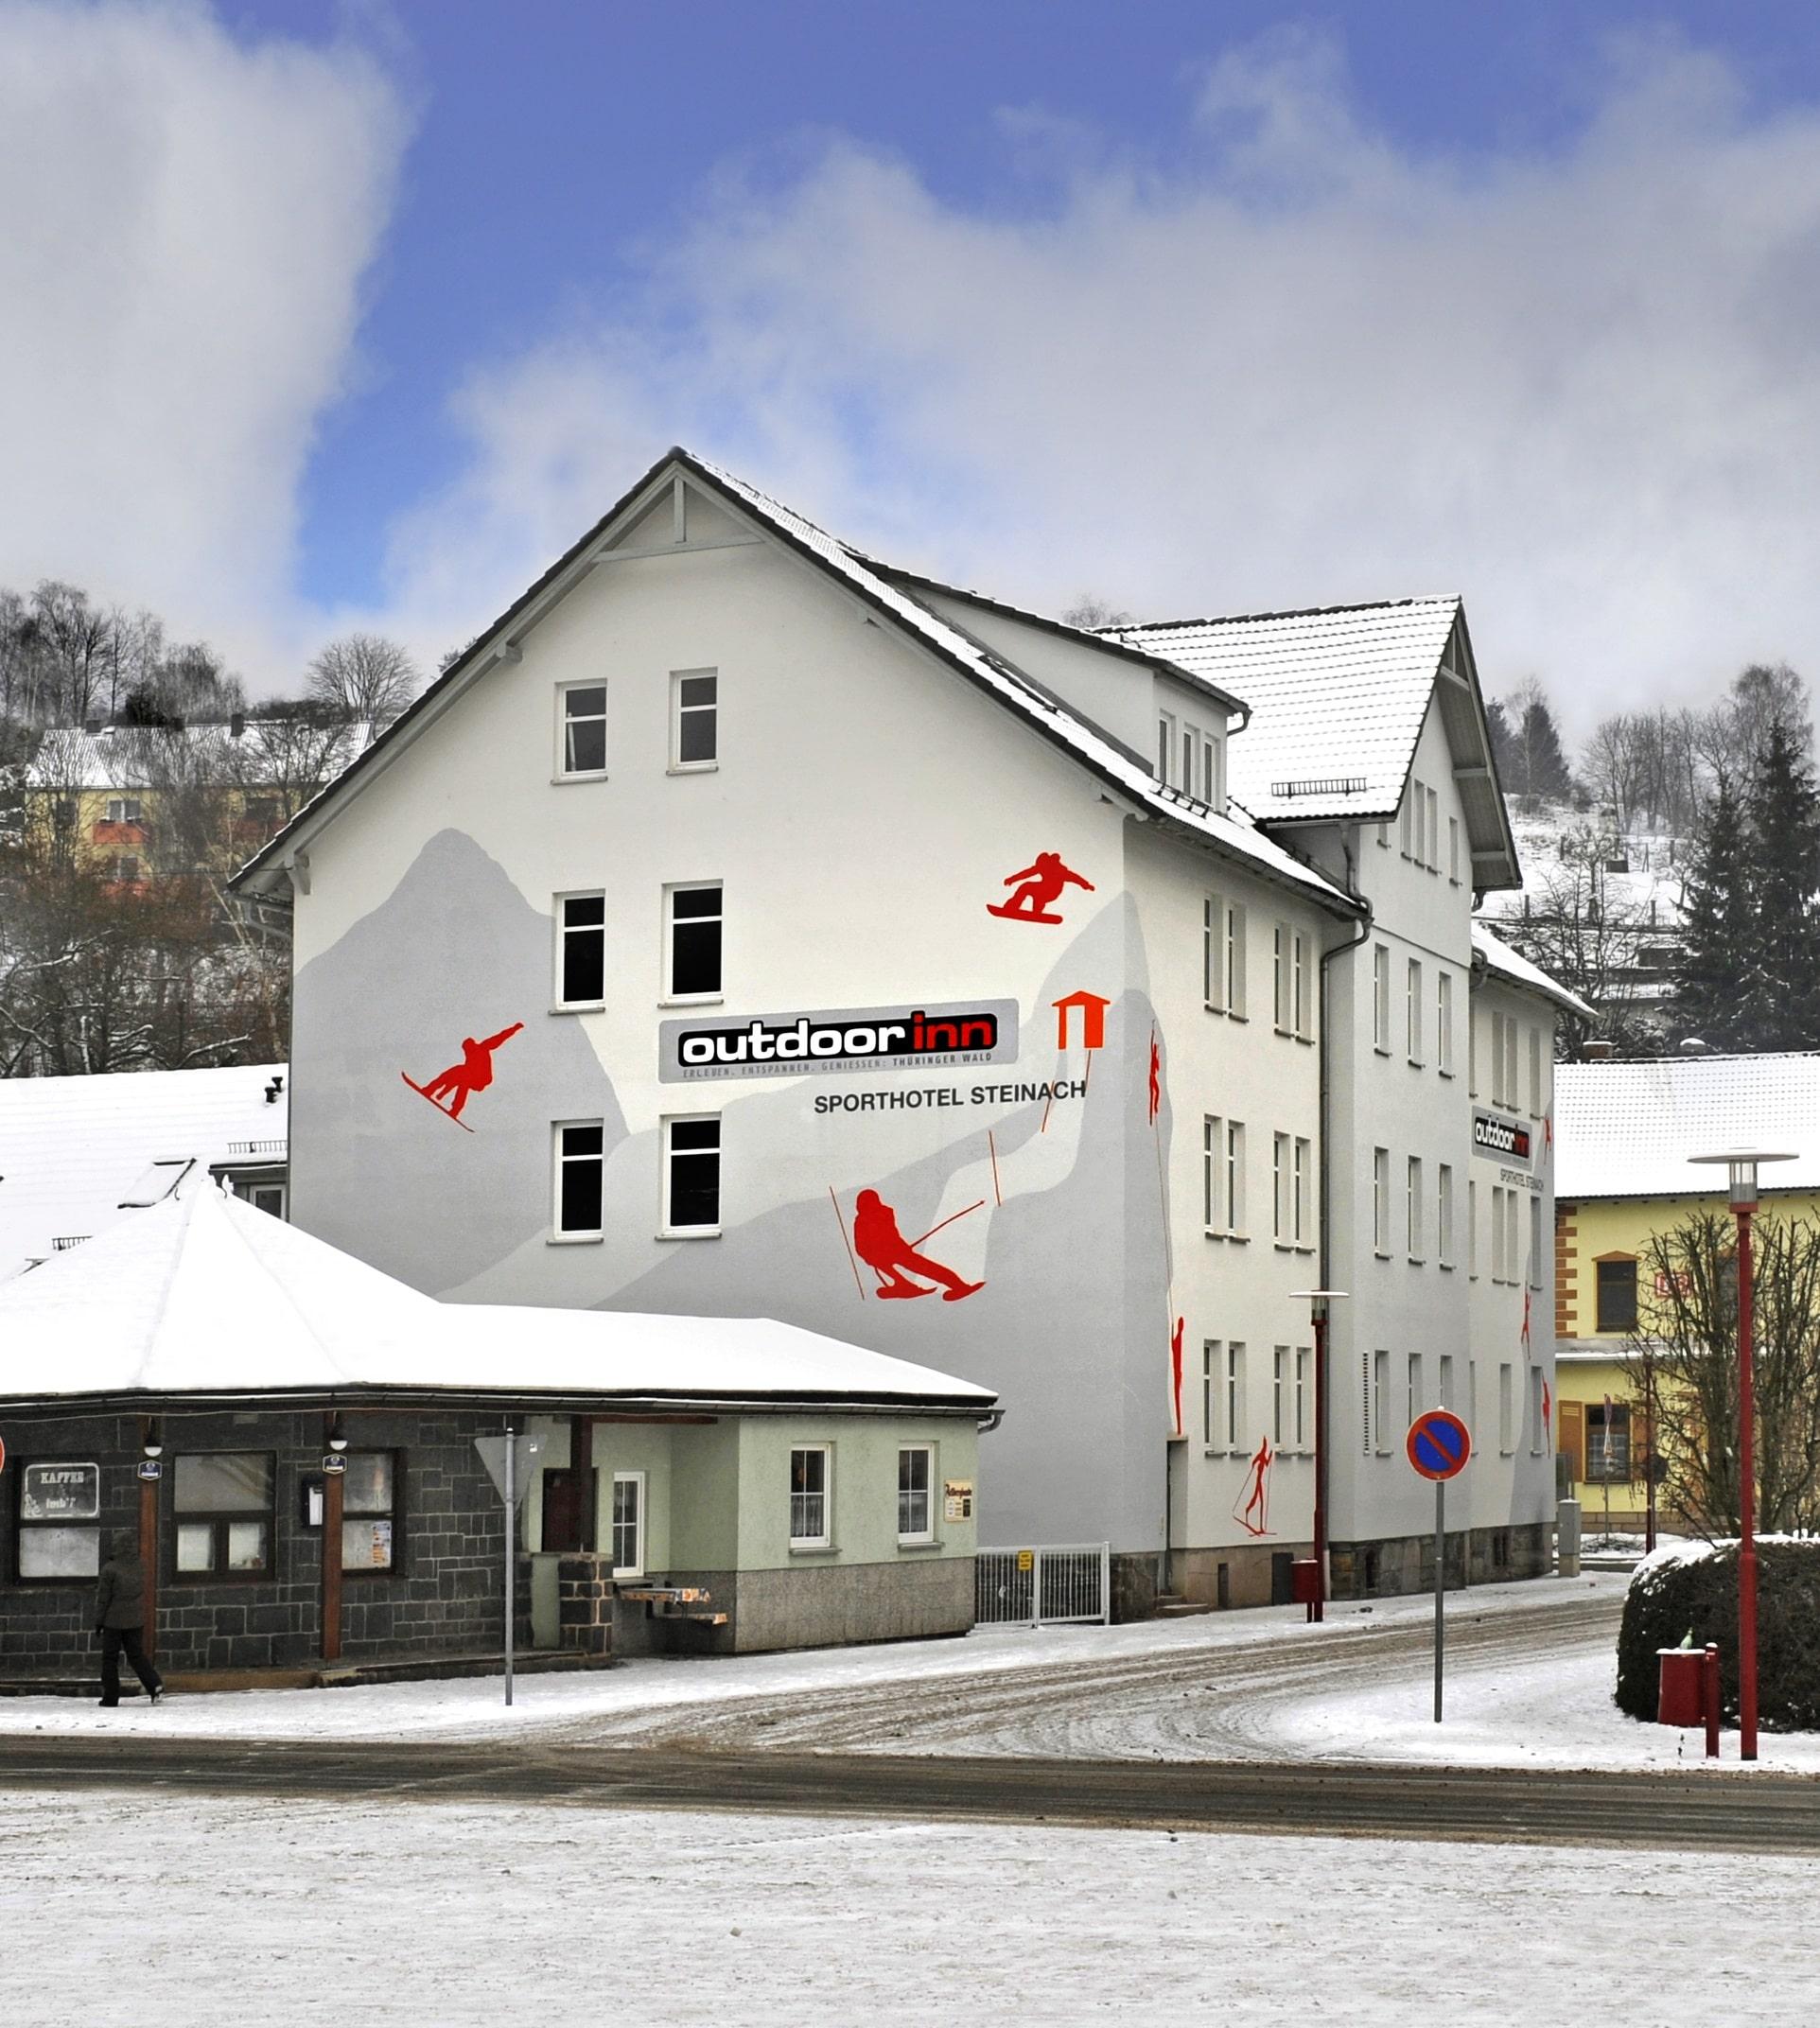 skiurlaub im th ringer wald th ringen alpin skiarena silbersattel. Black Bedroom Furniture Sets. Home Design Ideas